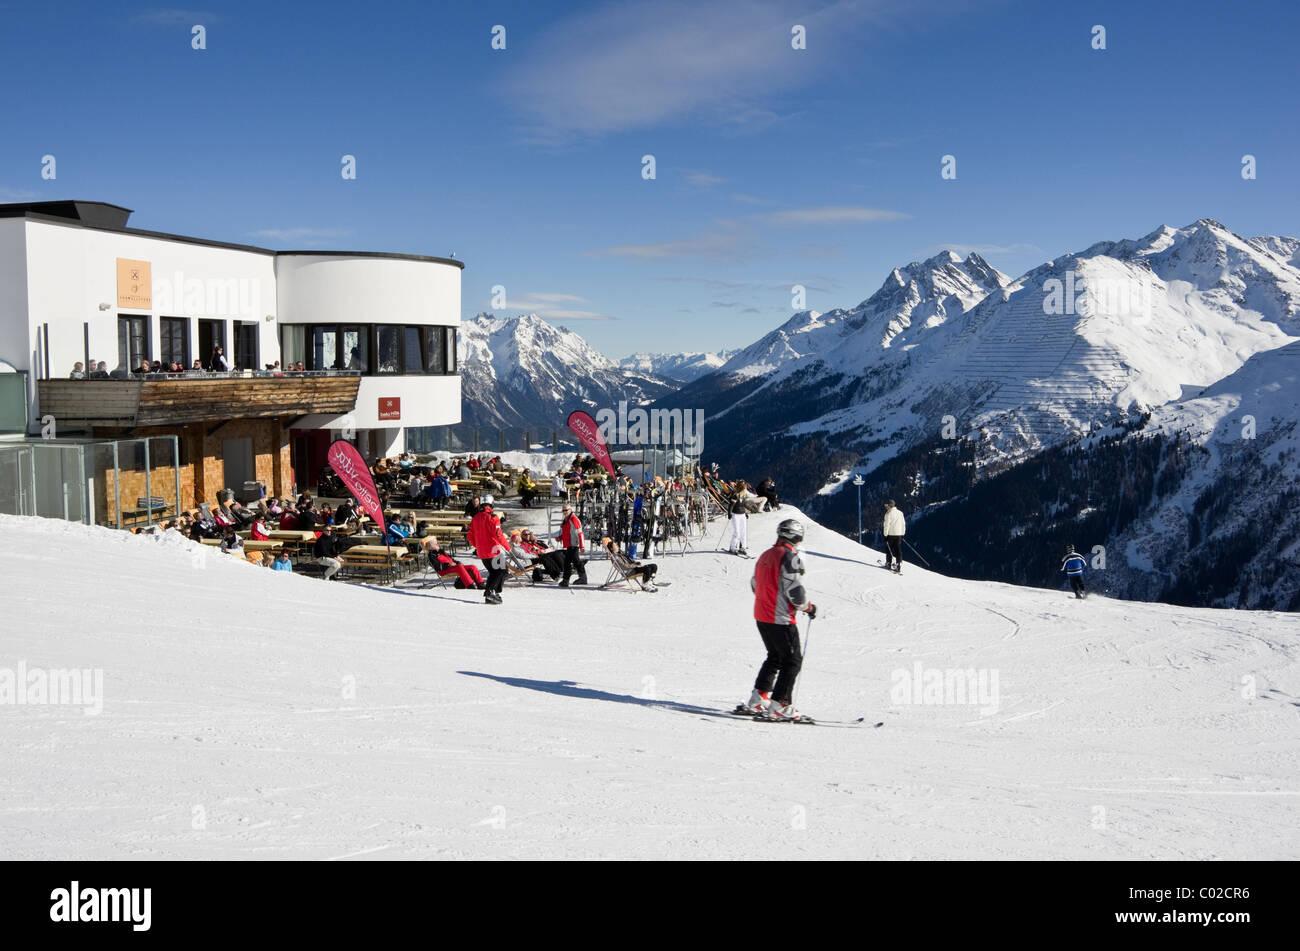 St Anton am Arleberg, Tyrol, Austria. Skiers on piste by Galzig gondola summit station with people sunbathing outside Stock Photo